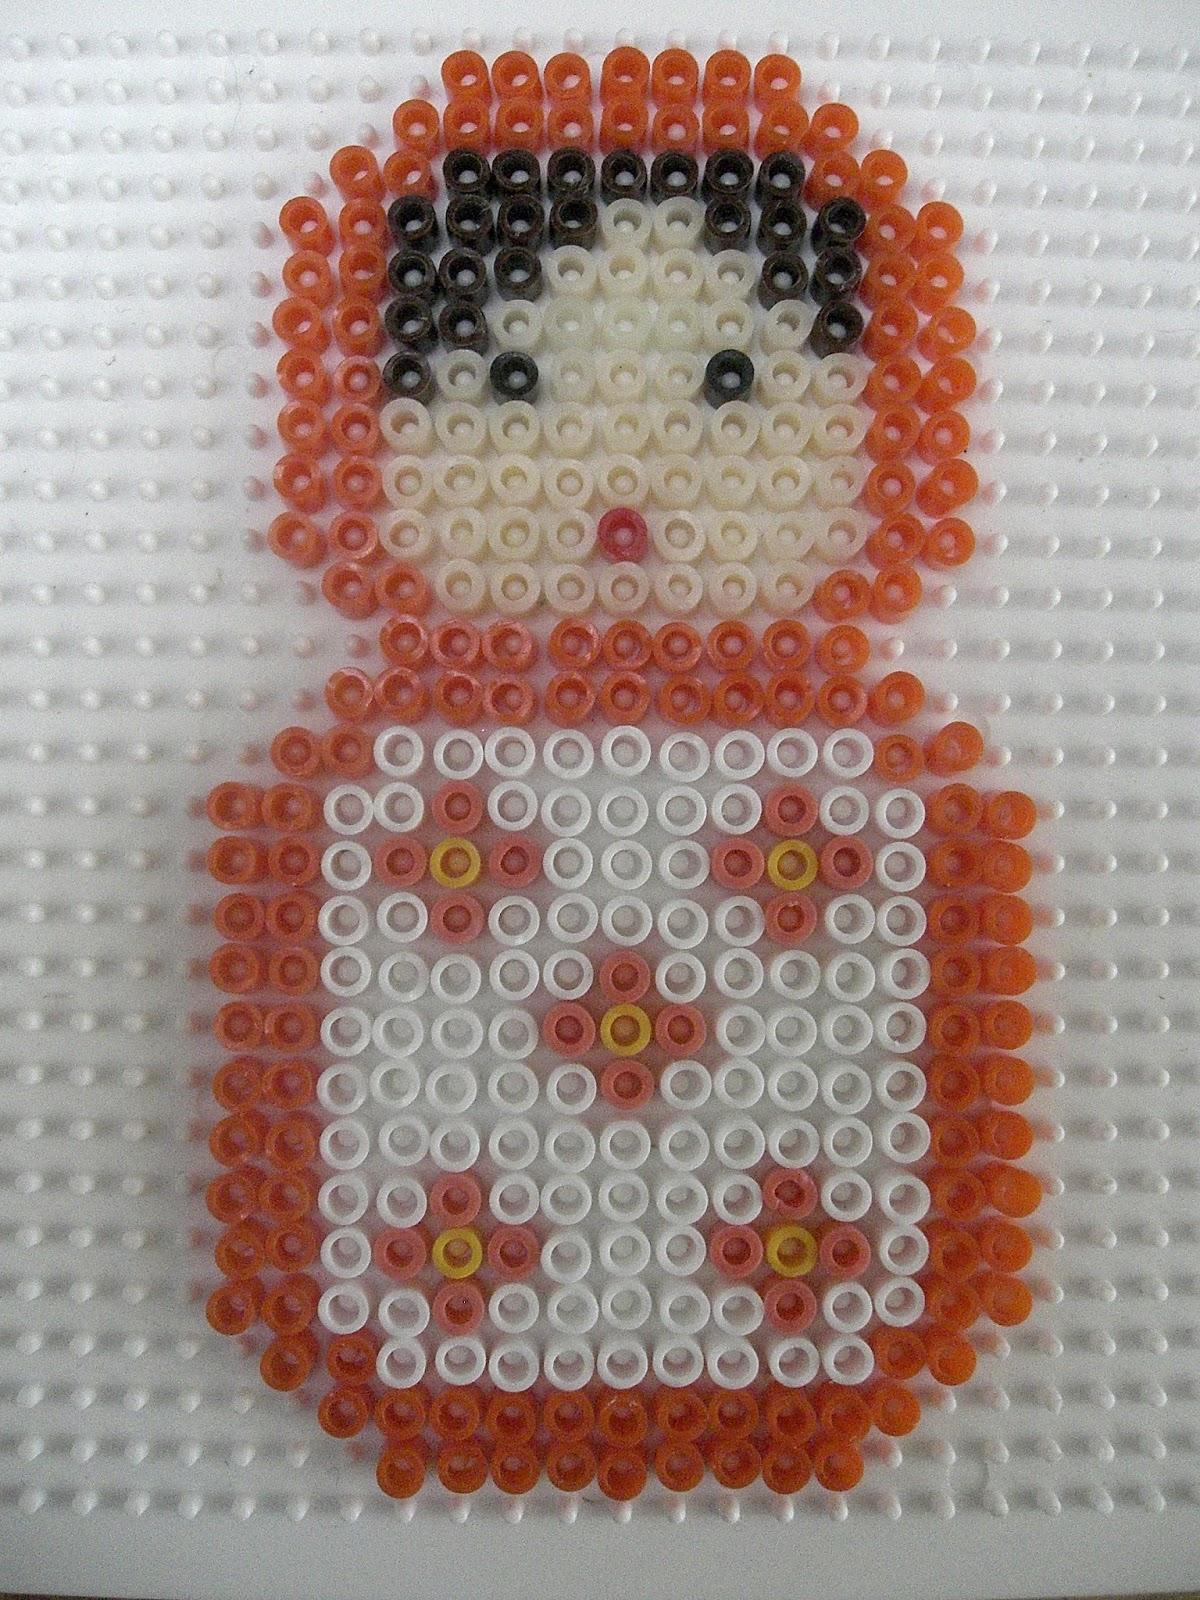 Gabulle in wonderland poup es russes en perles hama - Perles a repasser modeles gratuit ...